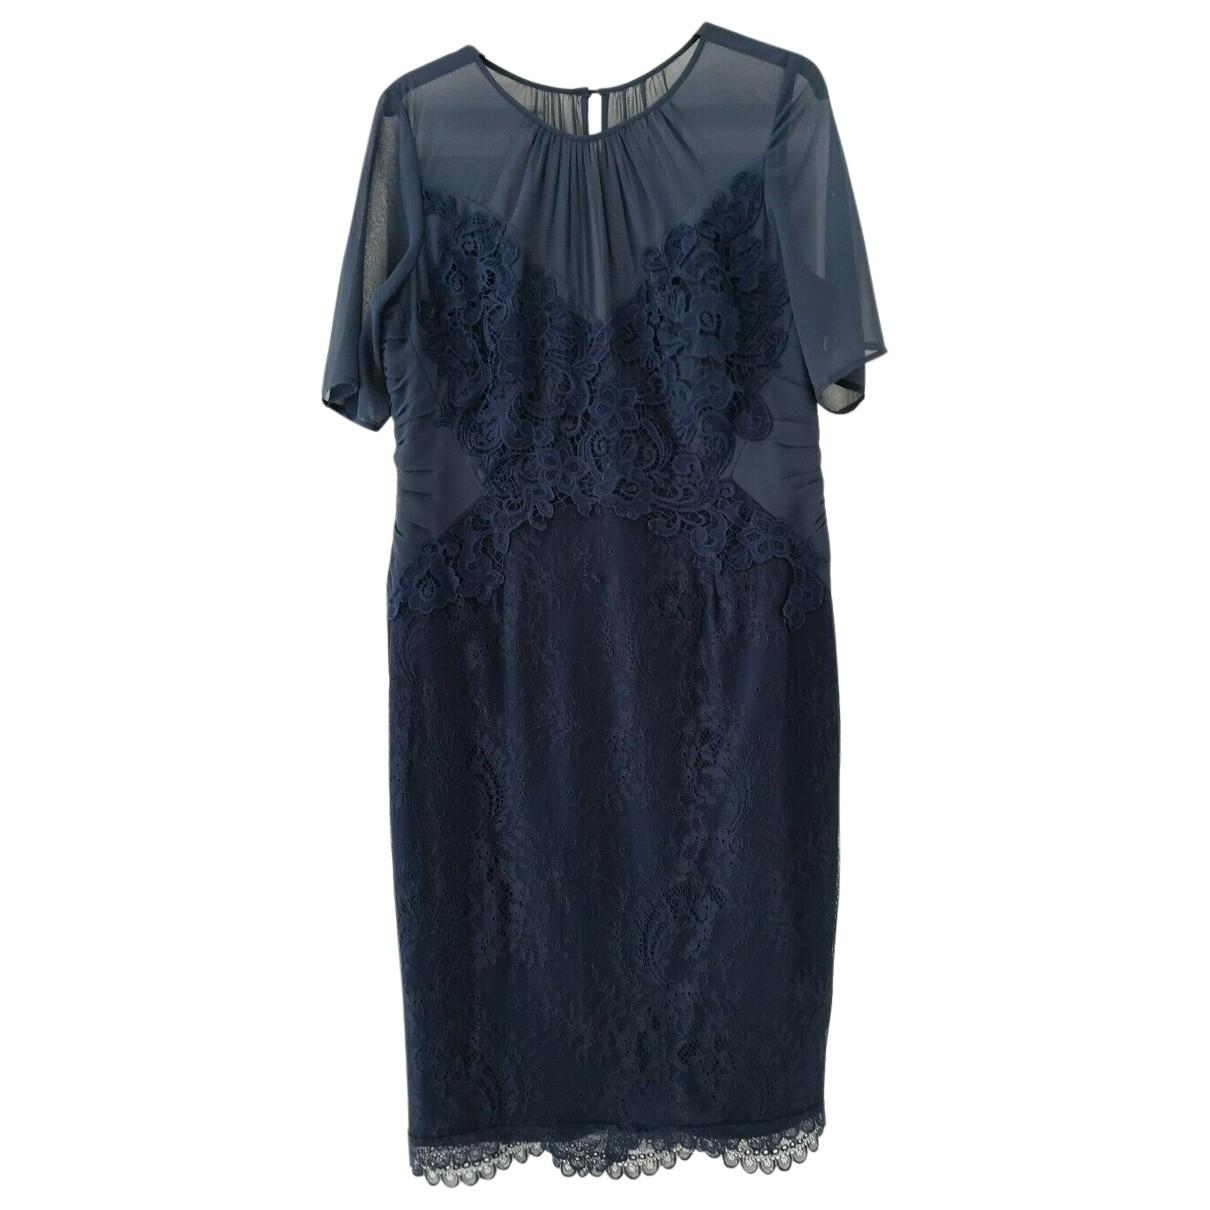 Coast \N Navy dress for Women 8 UK